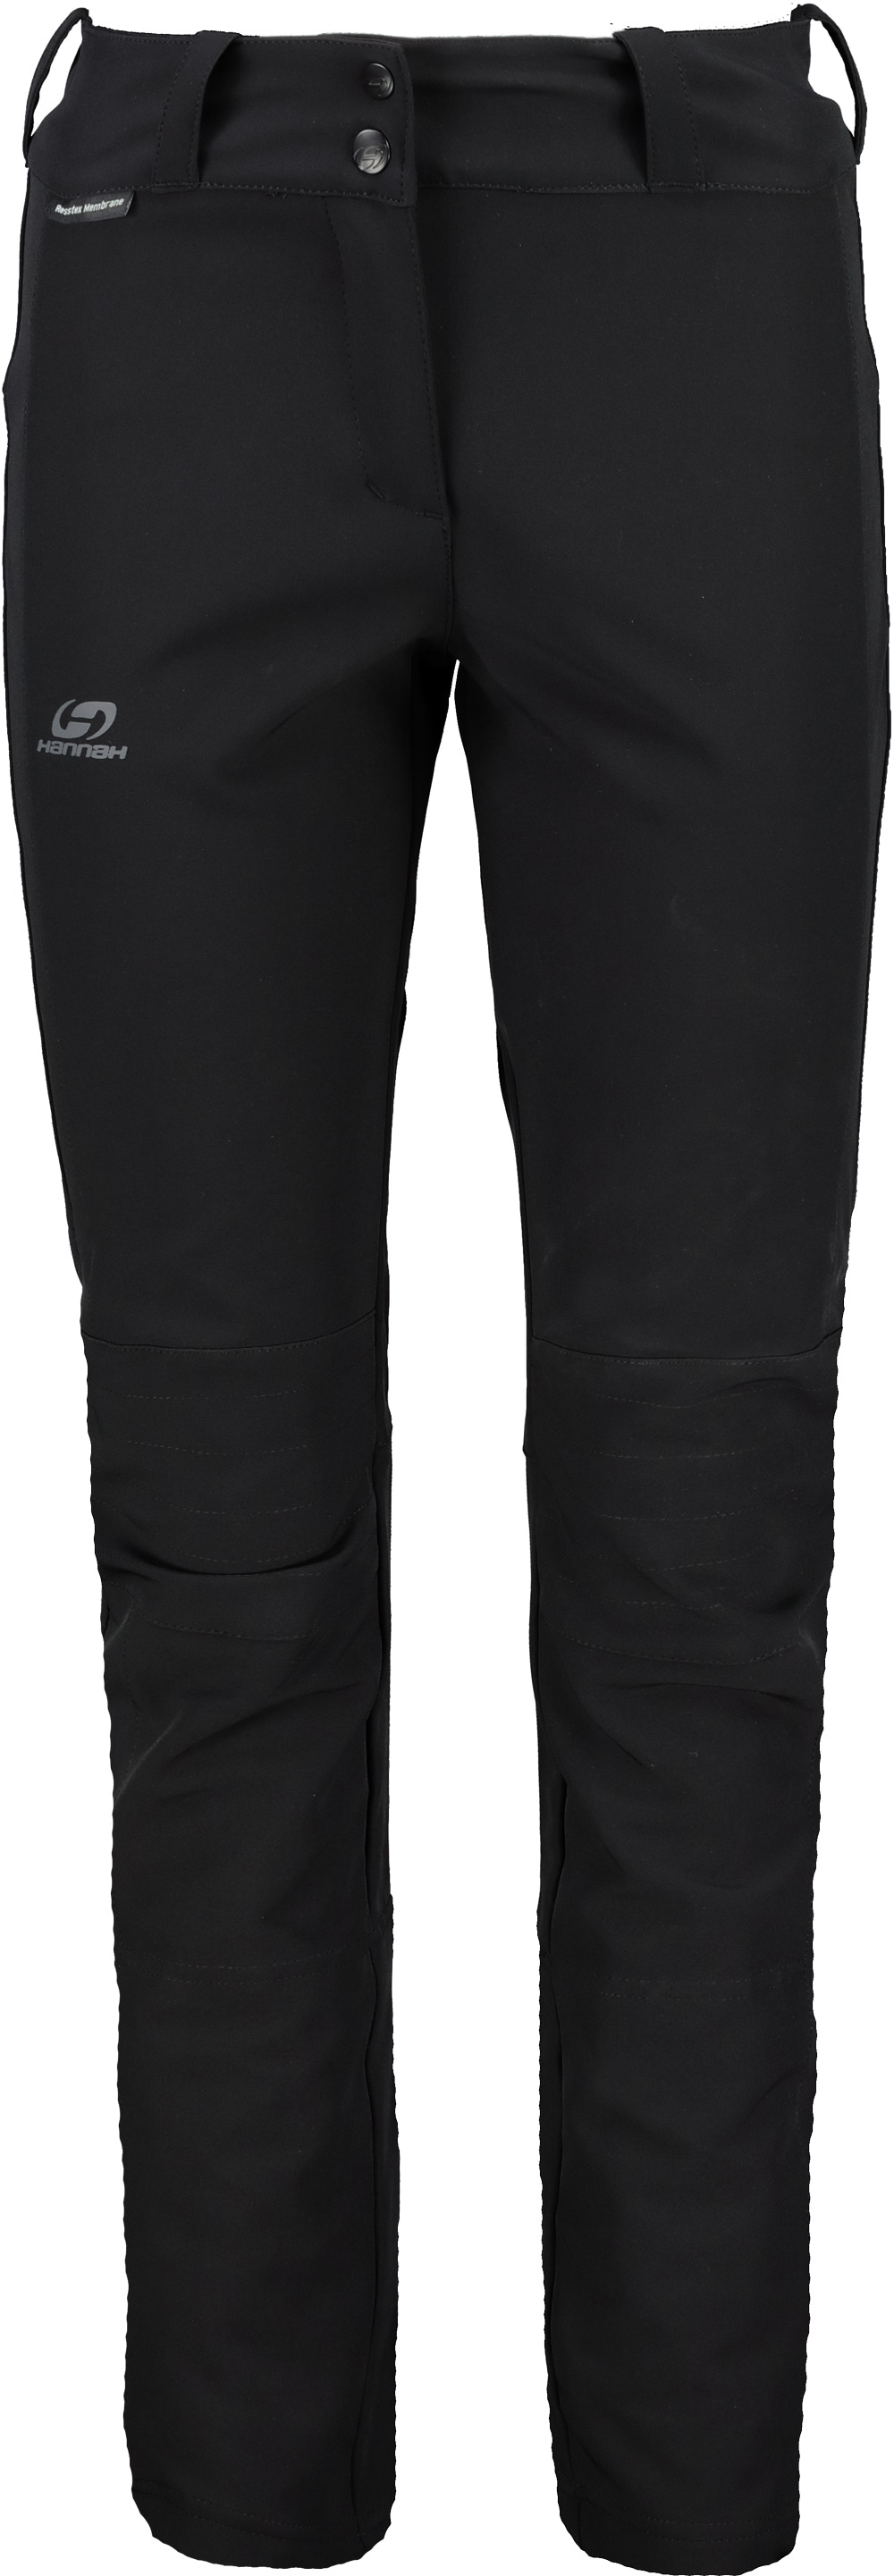 Kalhoty softshellové dámské HANNAH Ilia